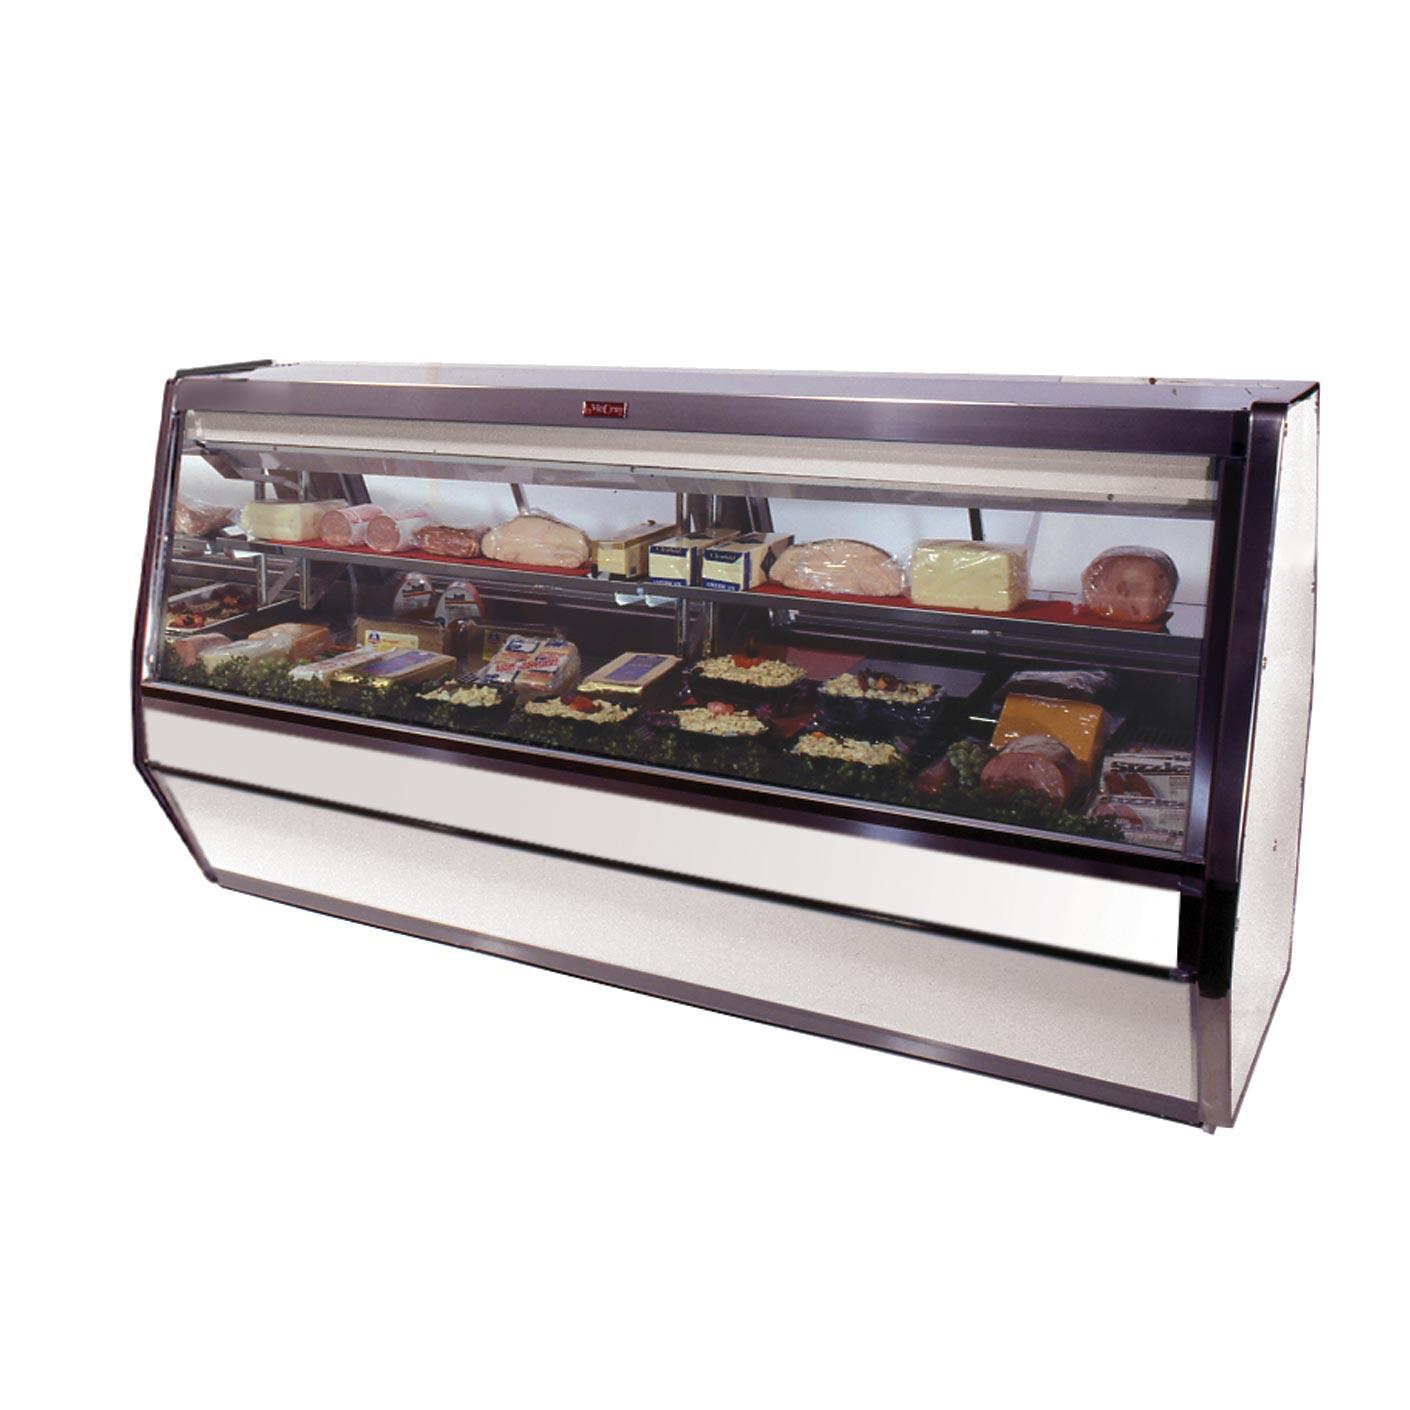 Howard-McCray SC-CDS40E-8-S-LED display case, refrigerated deli